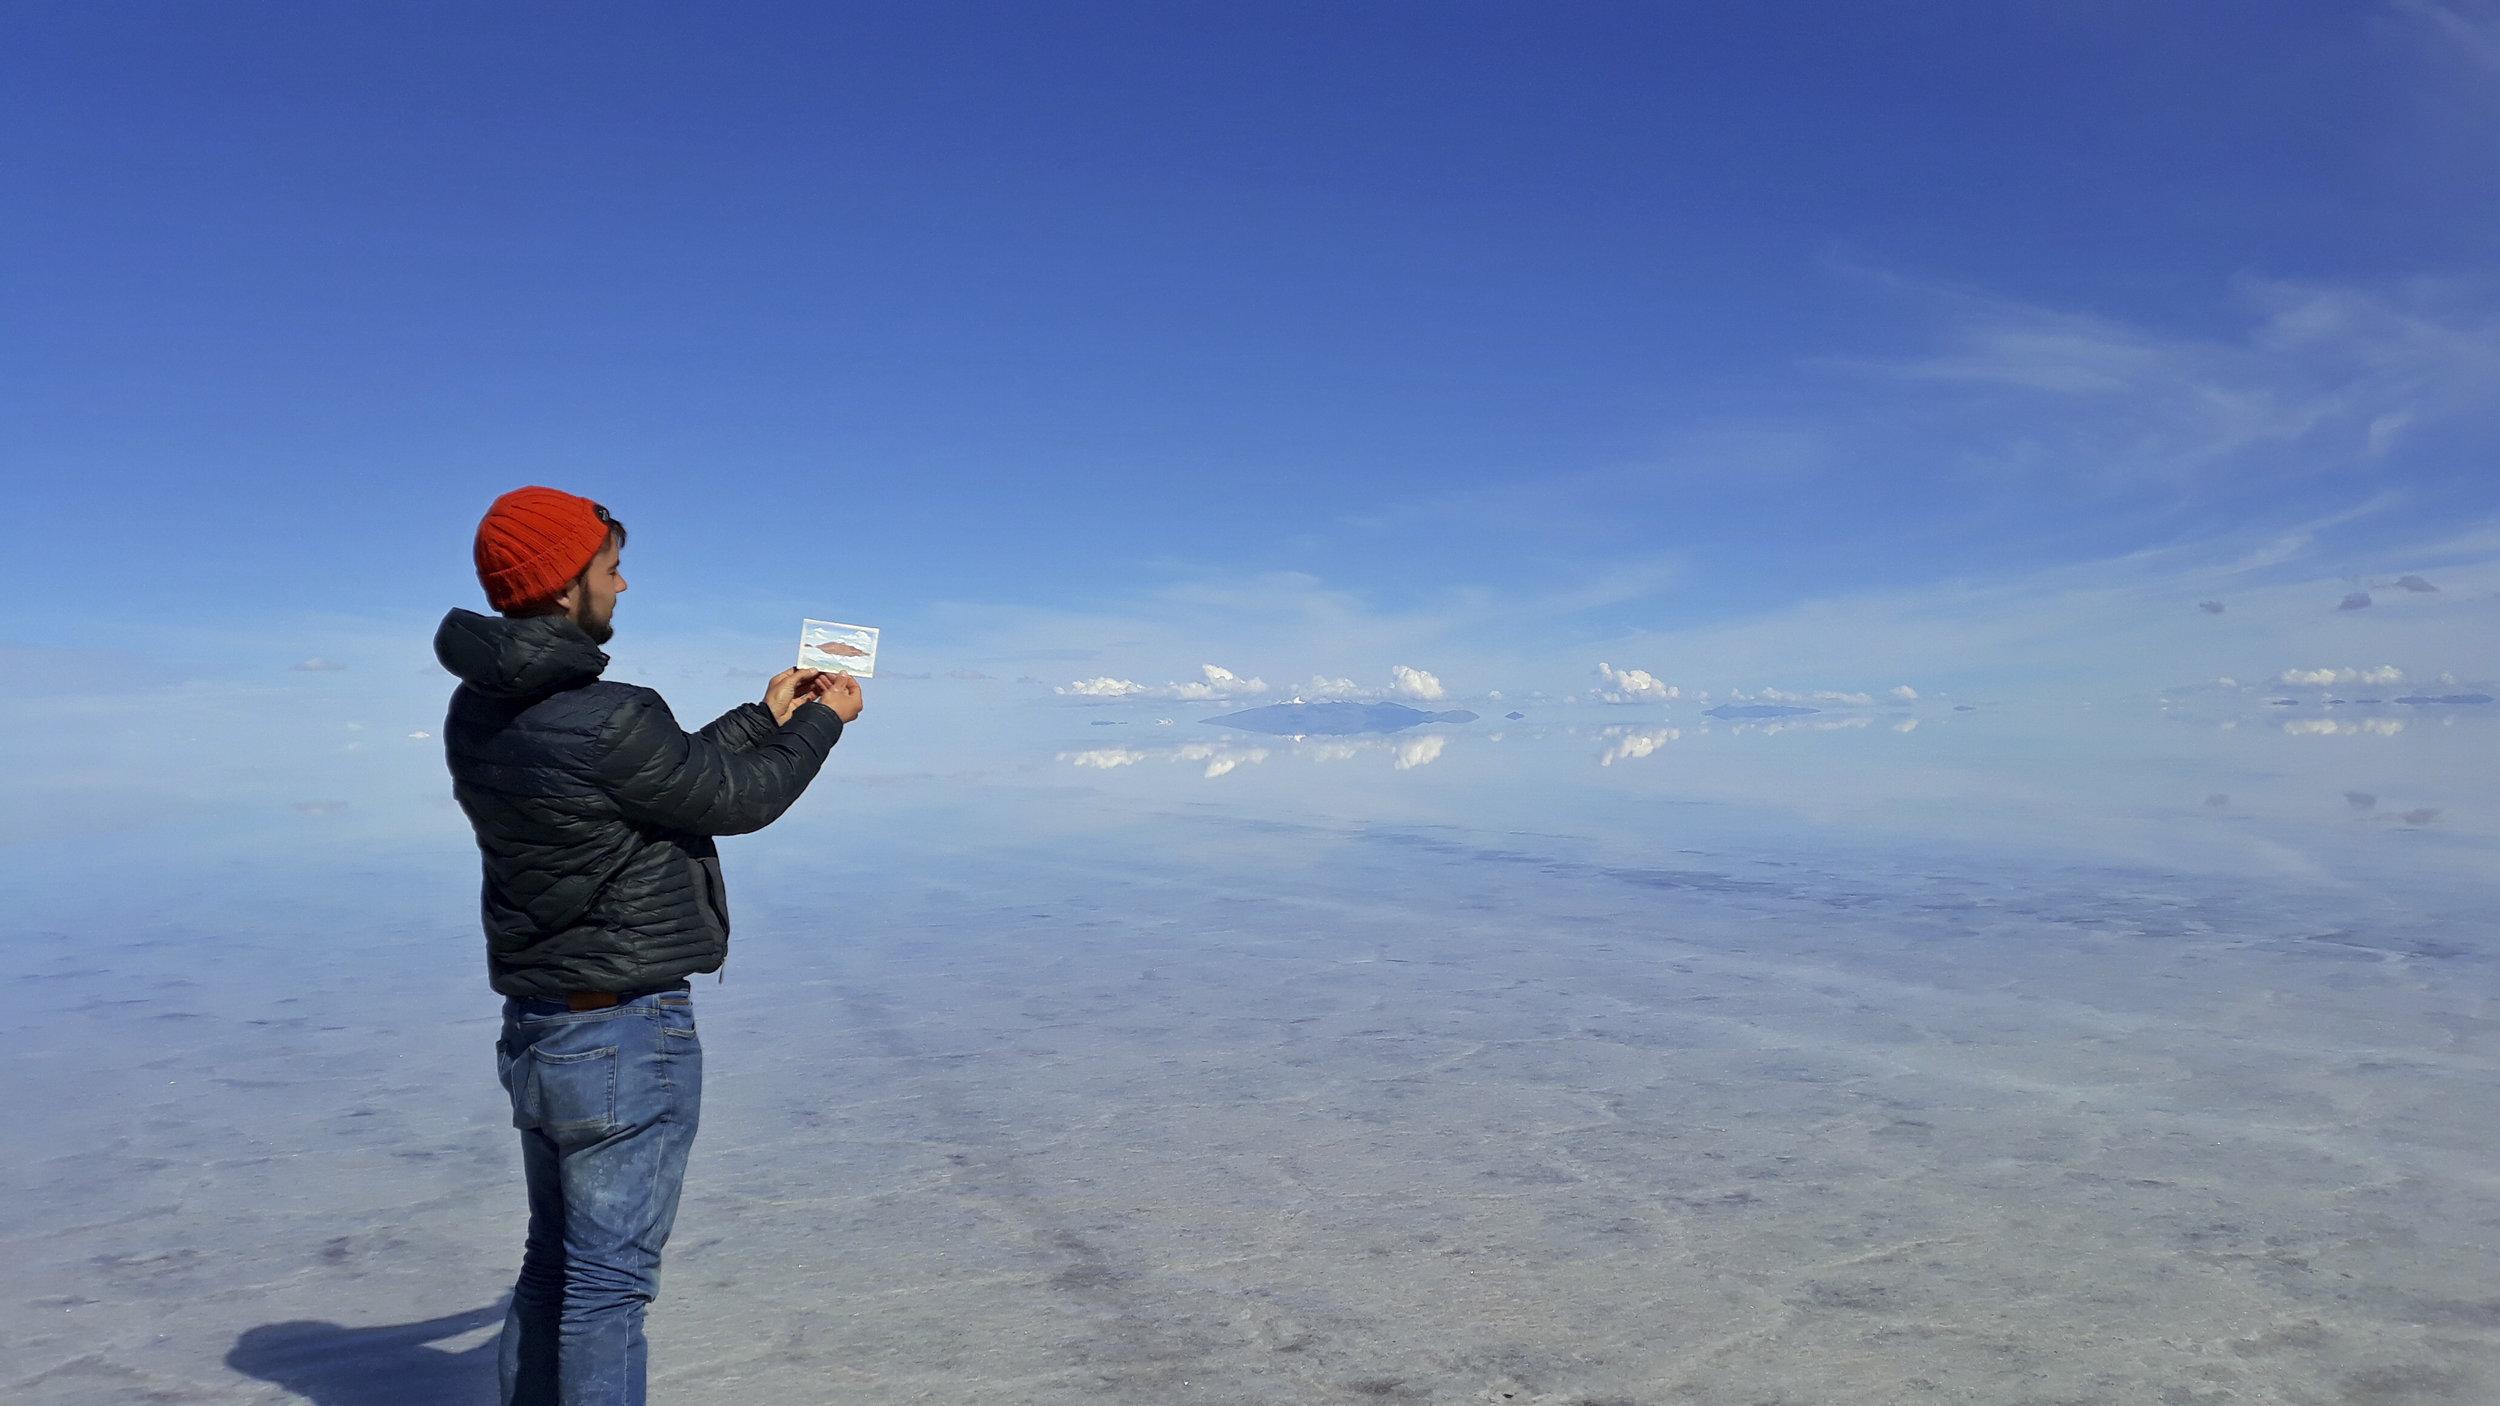 Nature S Mirror Salar De Uyuni Plein Air Painting Bolivia Robbieallenartist